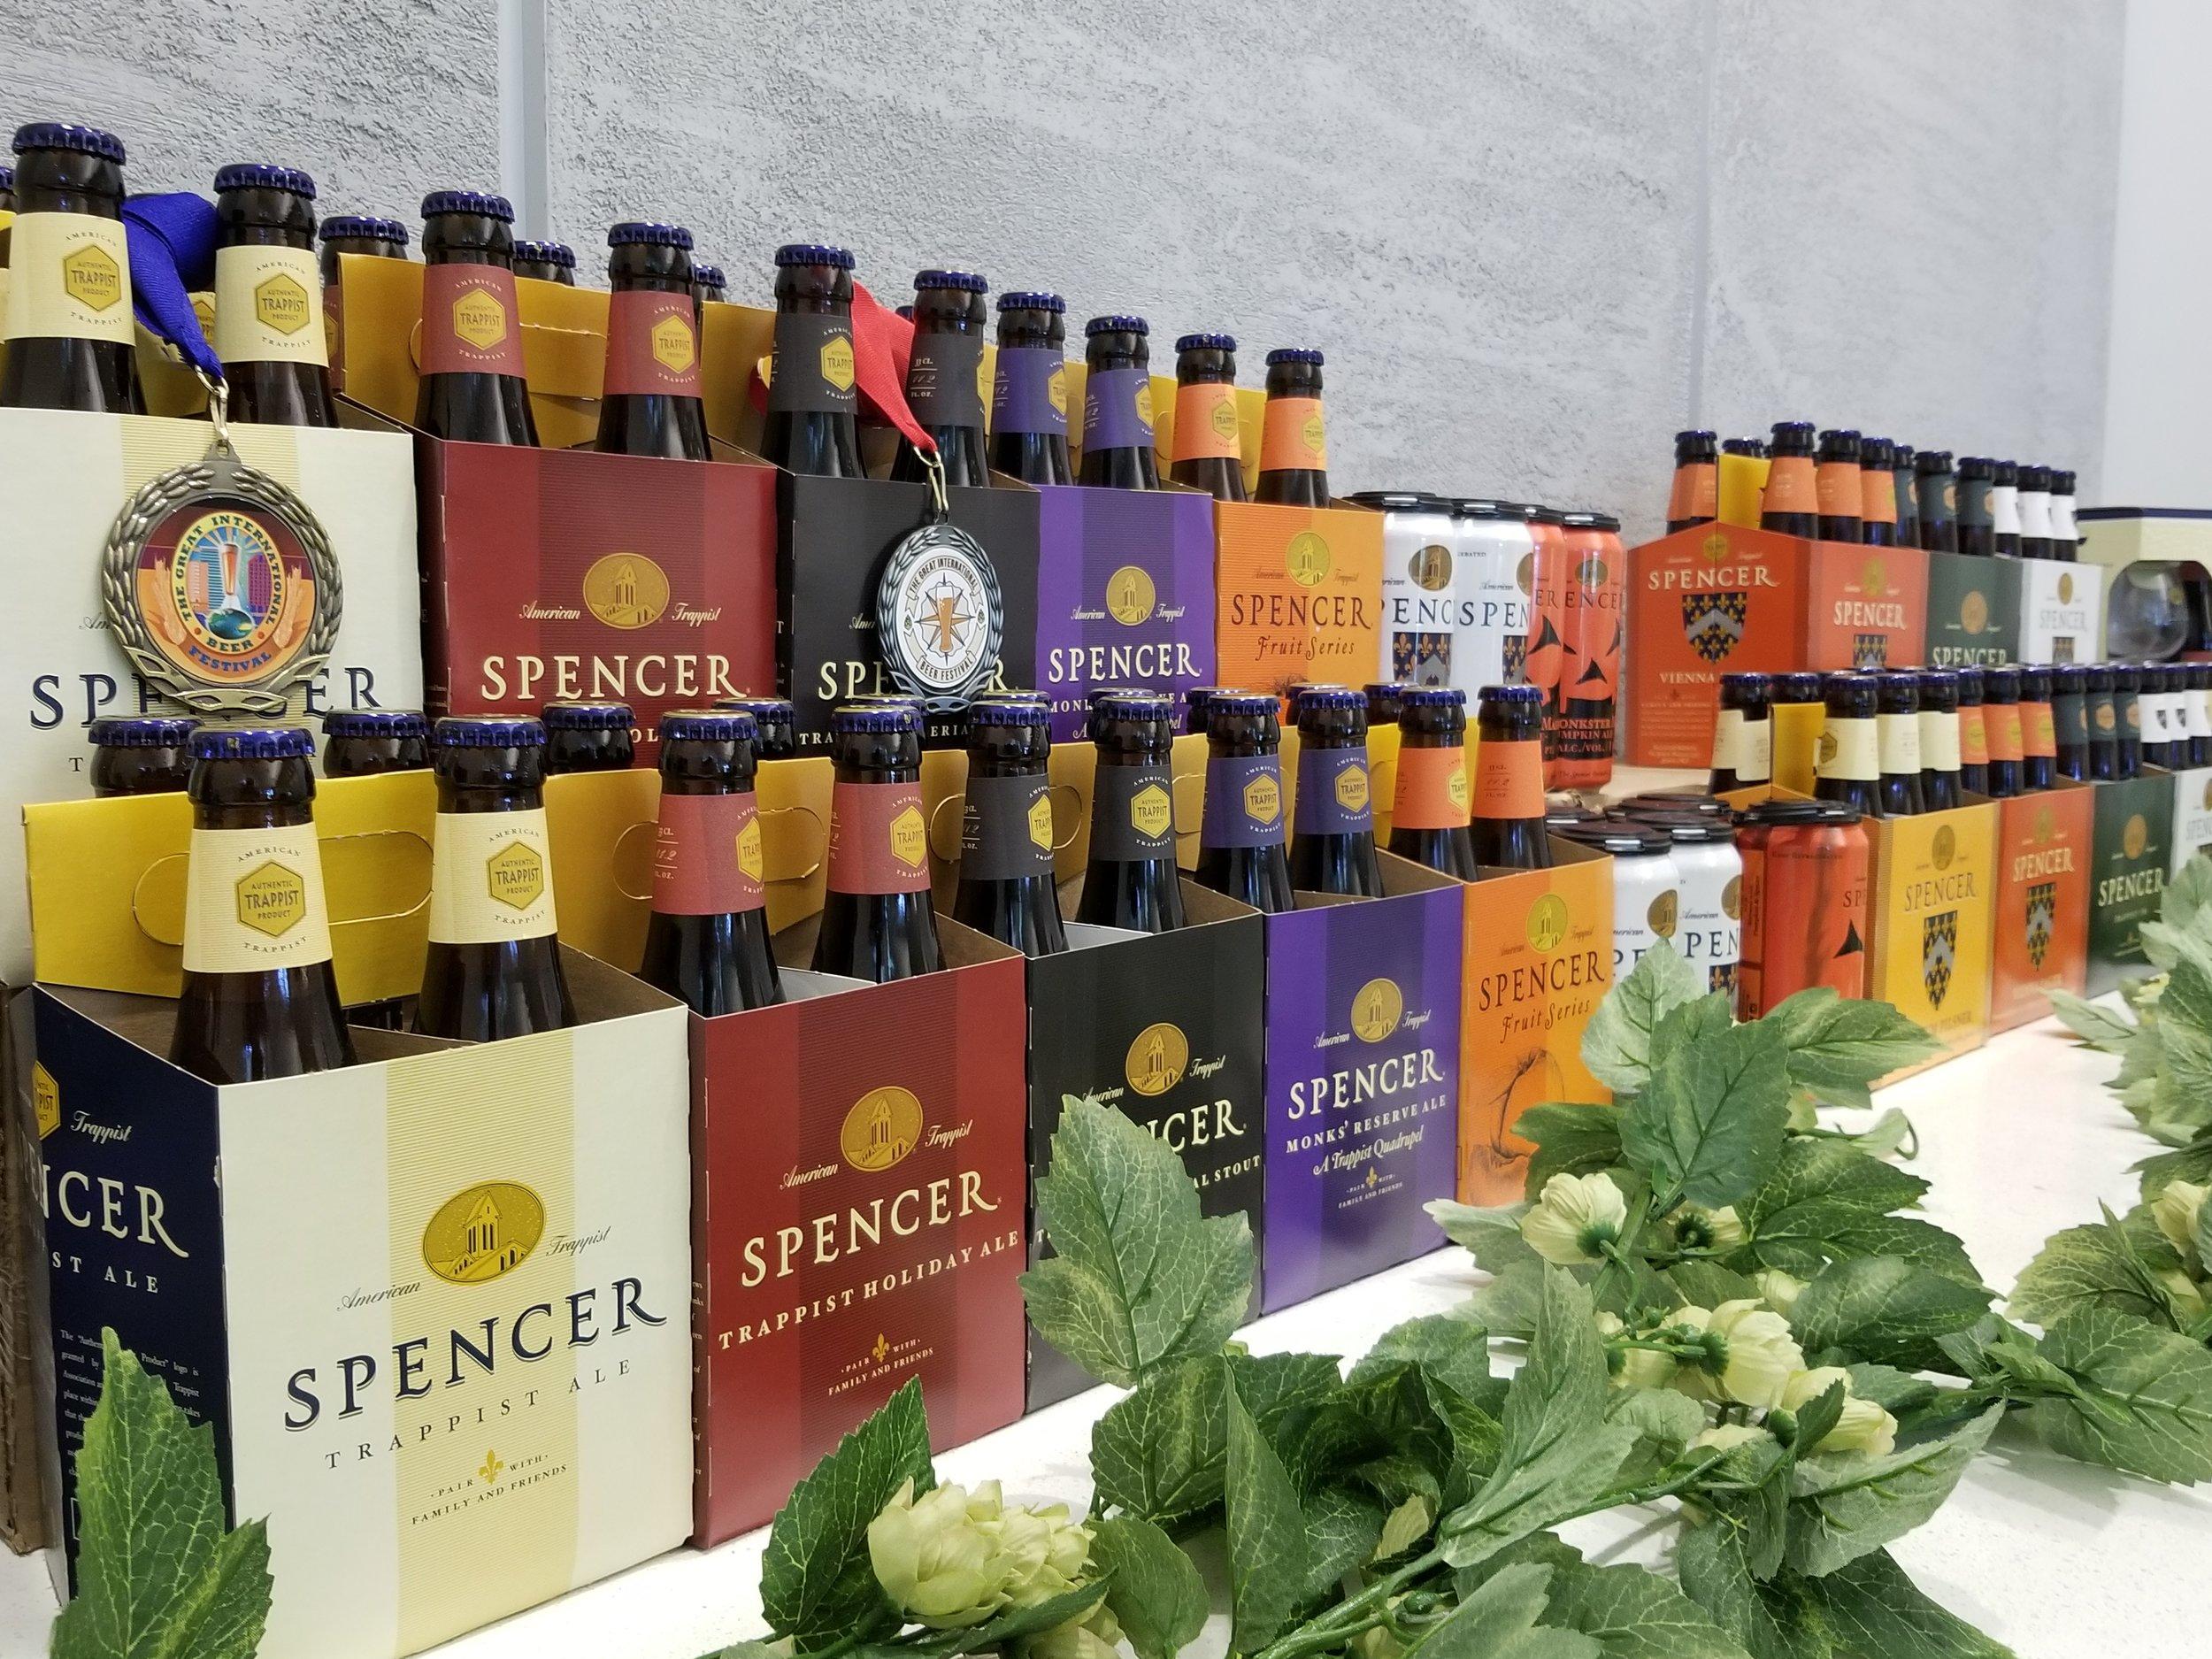 spencer beer.jpg